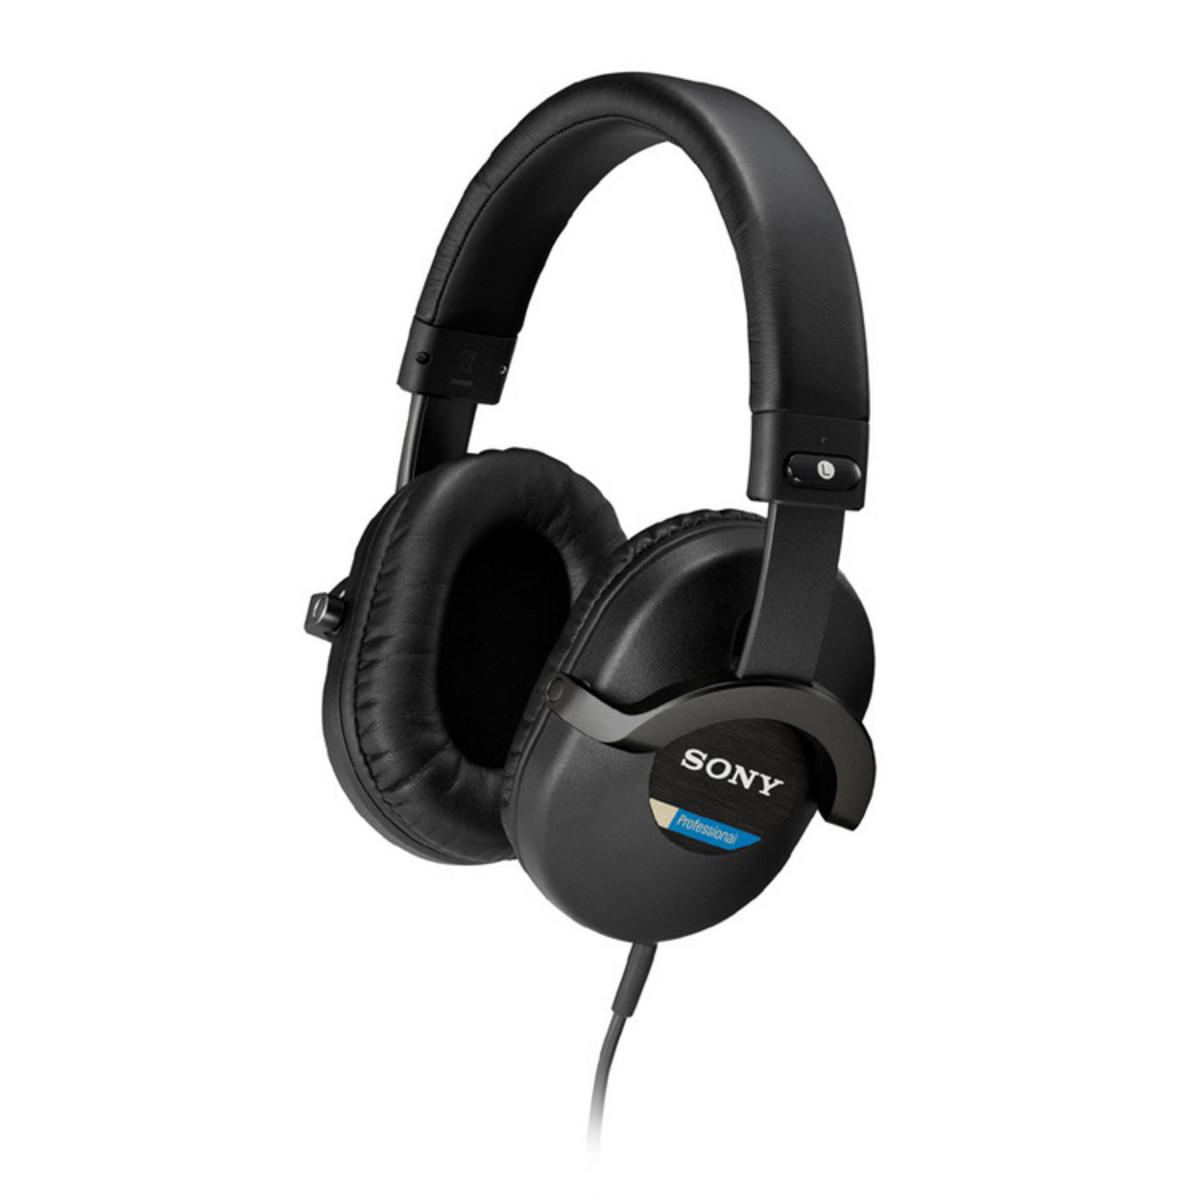 sony mdr 7510 professional studio monitor headphones at. Black Bedroom Furniture Sets. Home Design Ideas